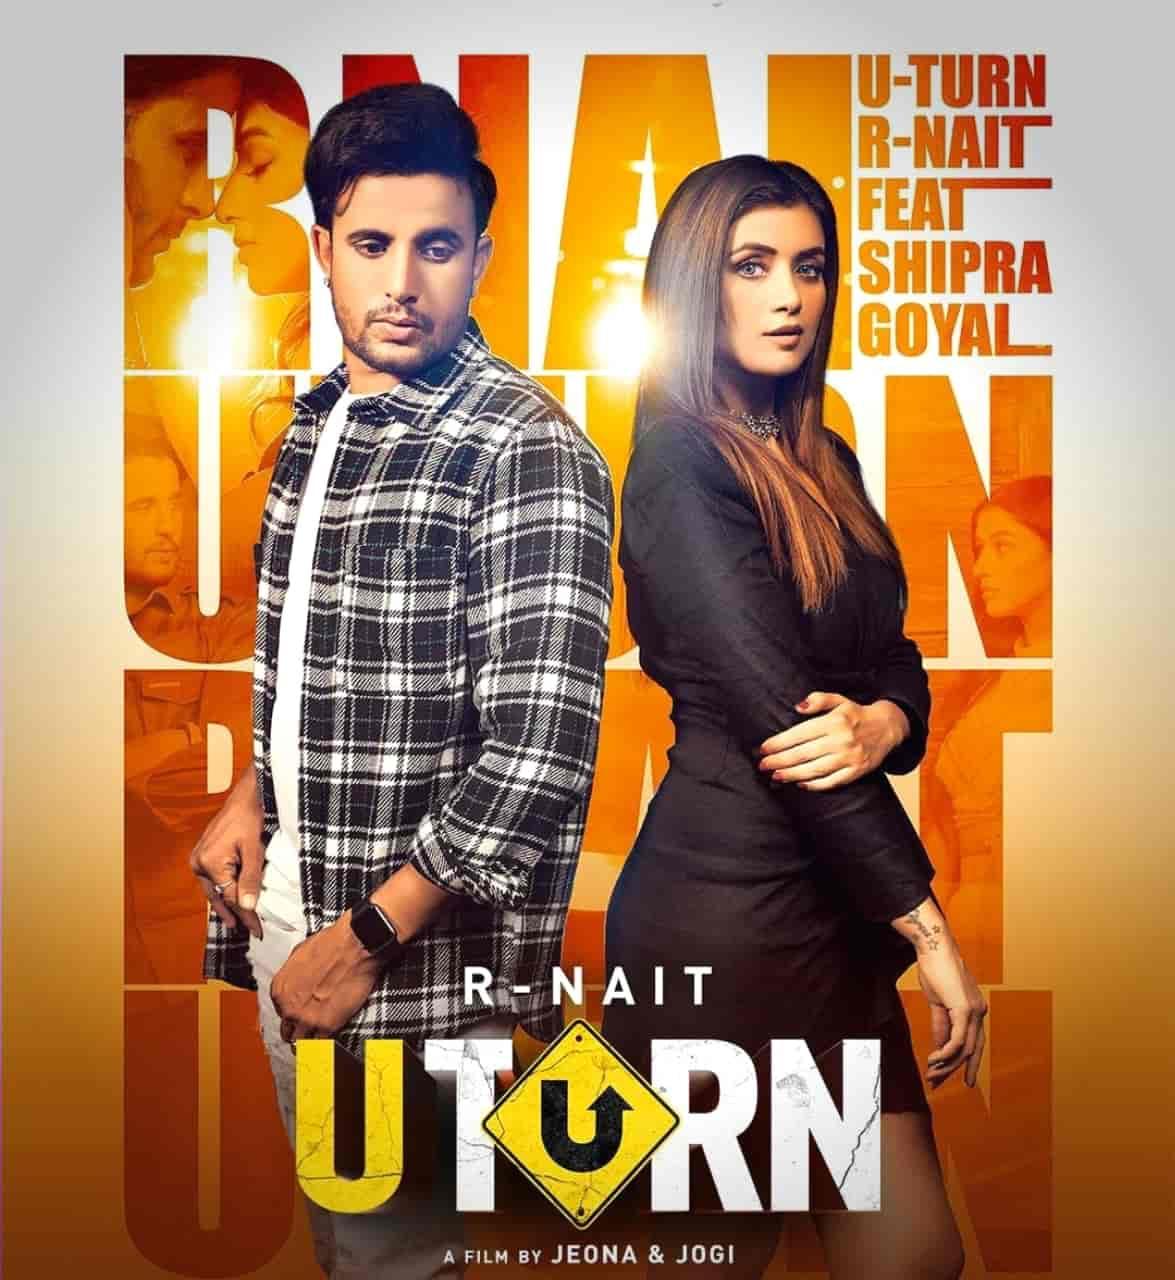 U Turn Punjabi Song Image Features R Nait And Shipra Goyal